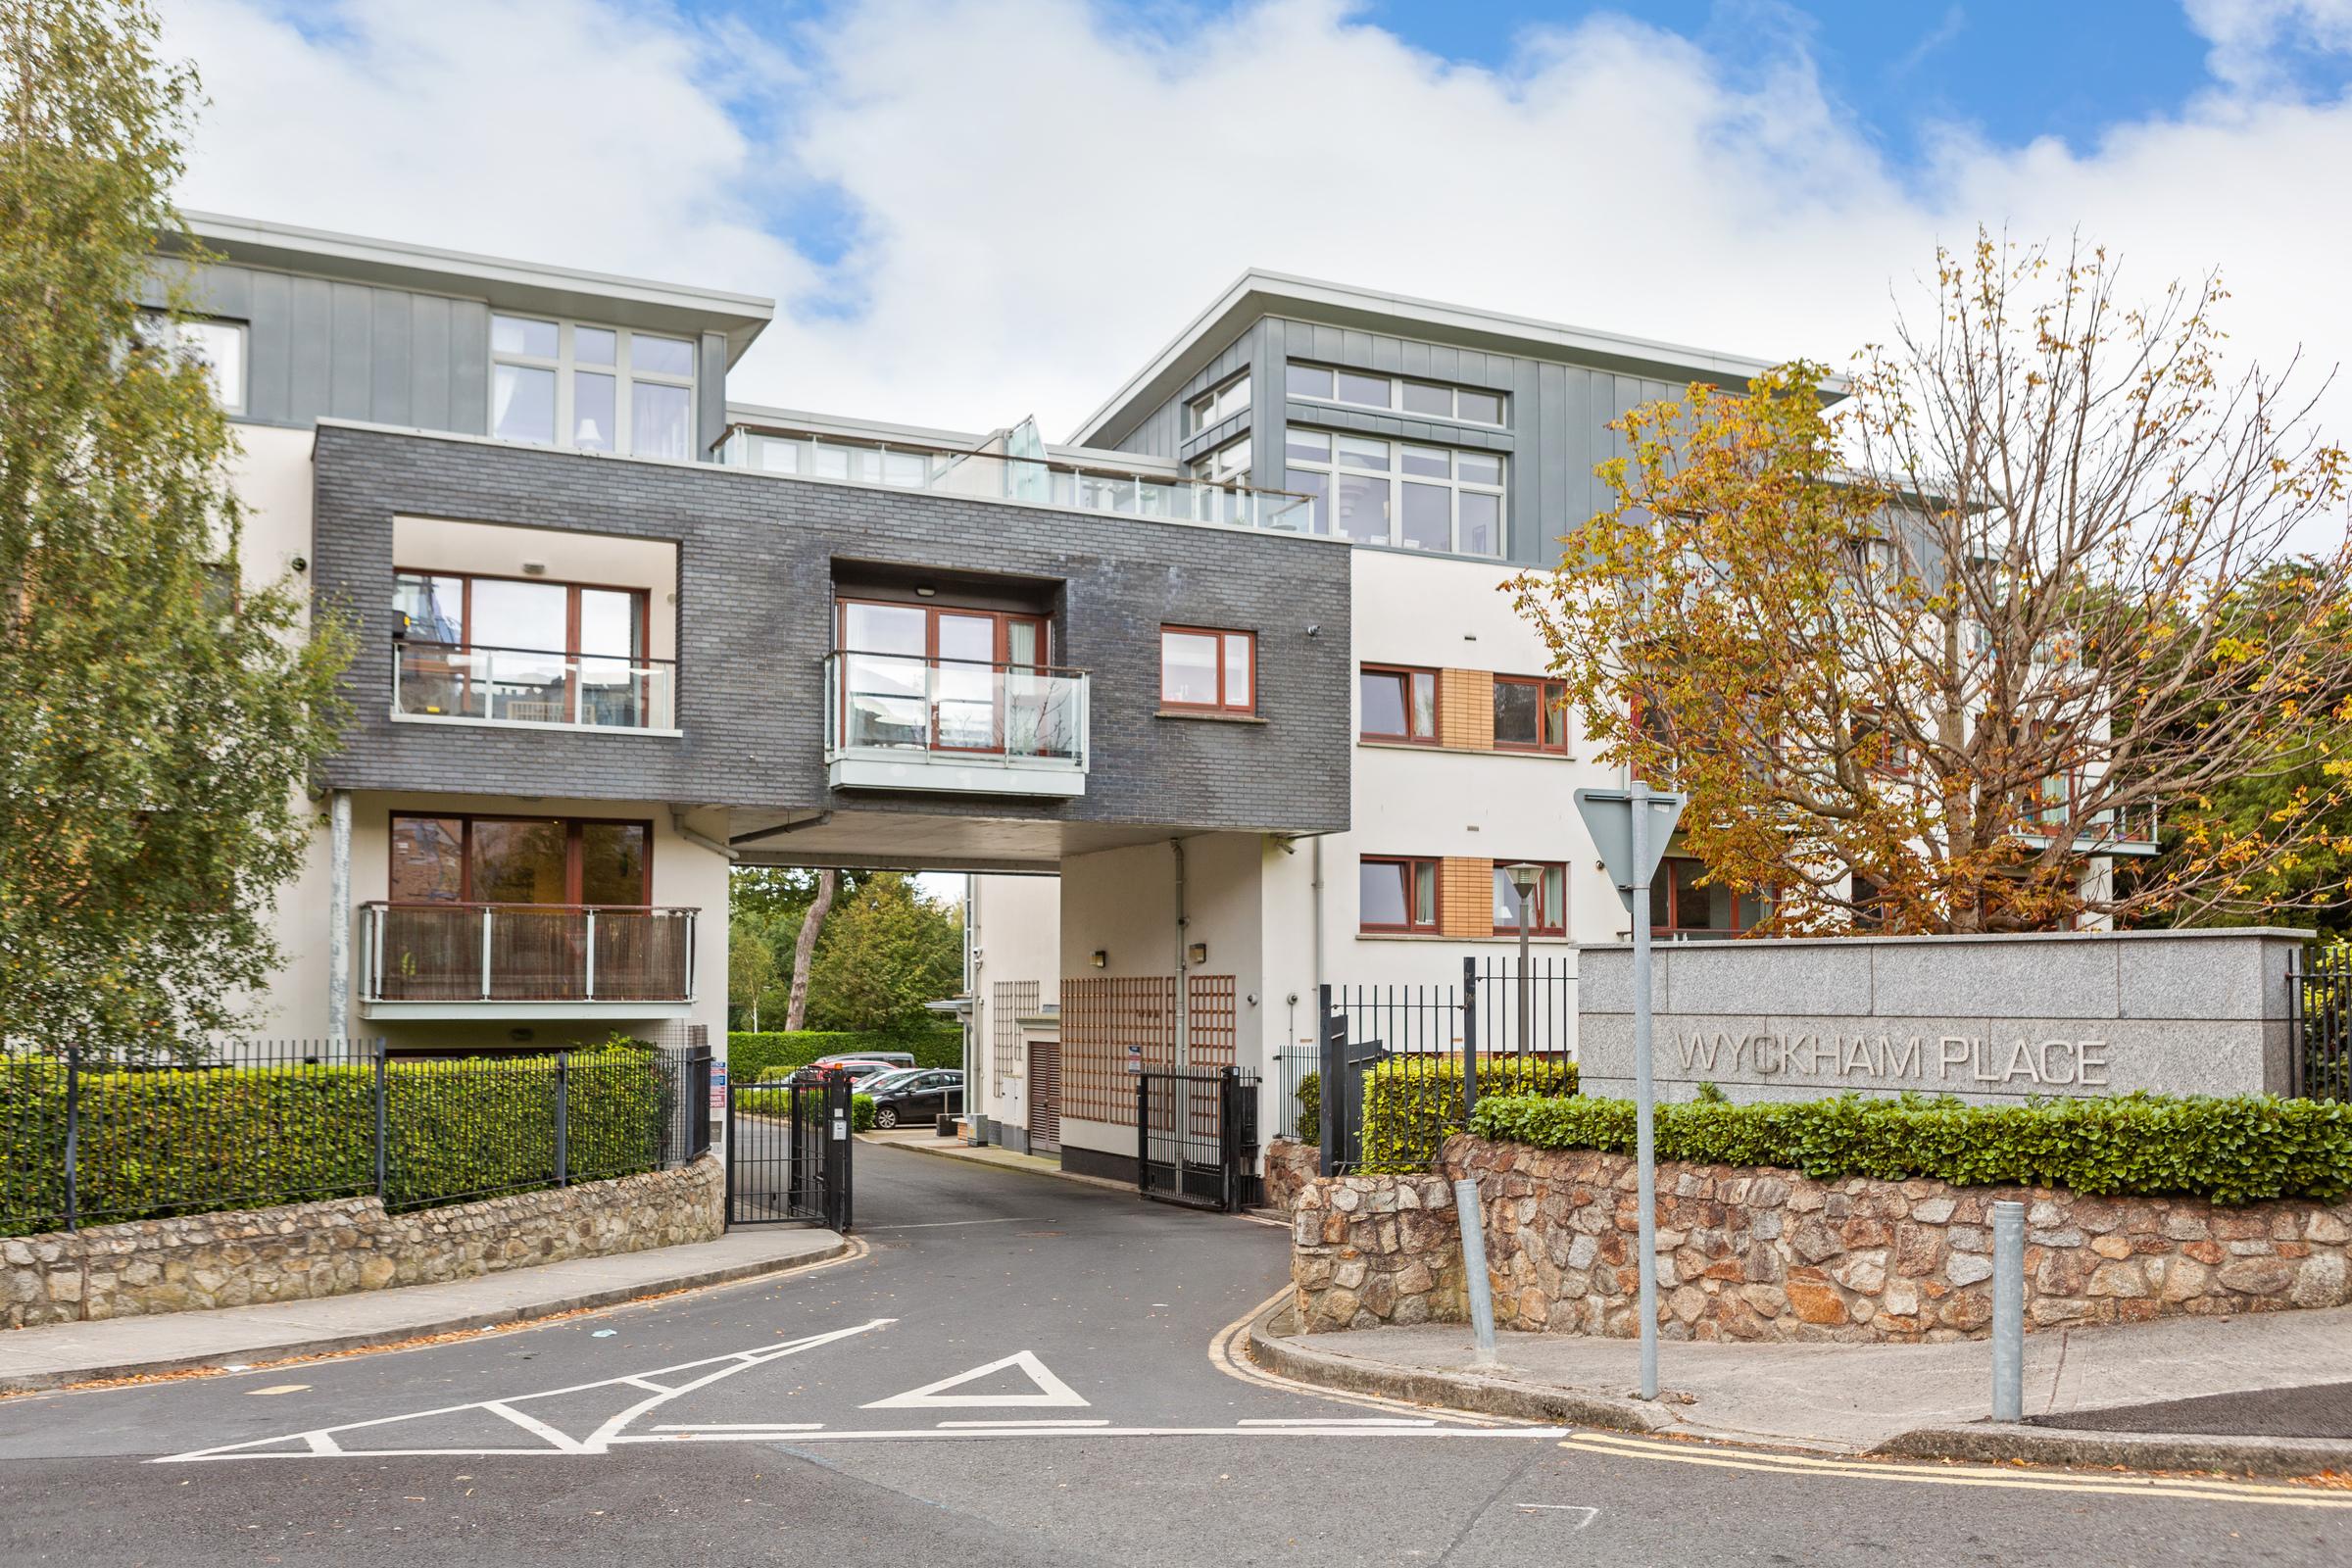 Apartment 18, Wyckham Place, Wyckham Way, Dundrum, Dublin 14